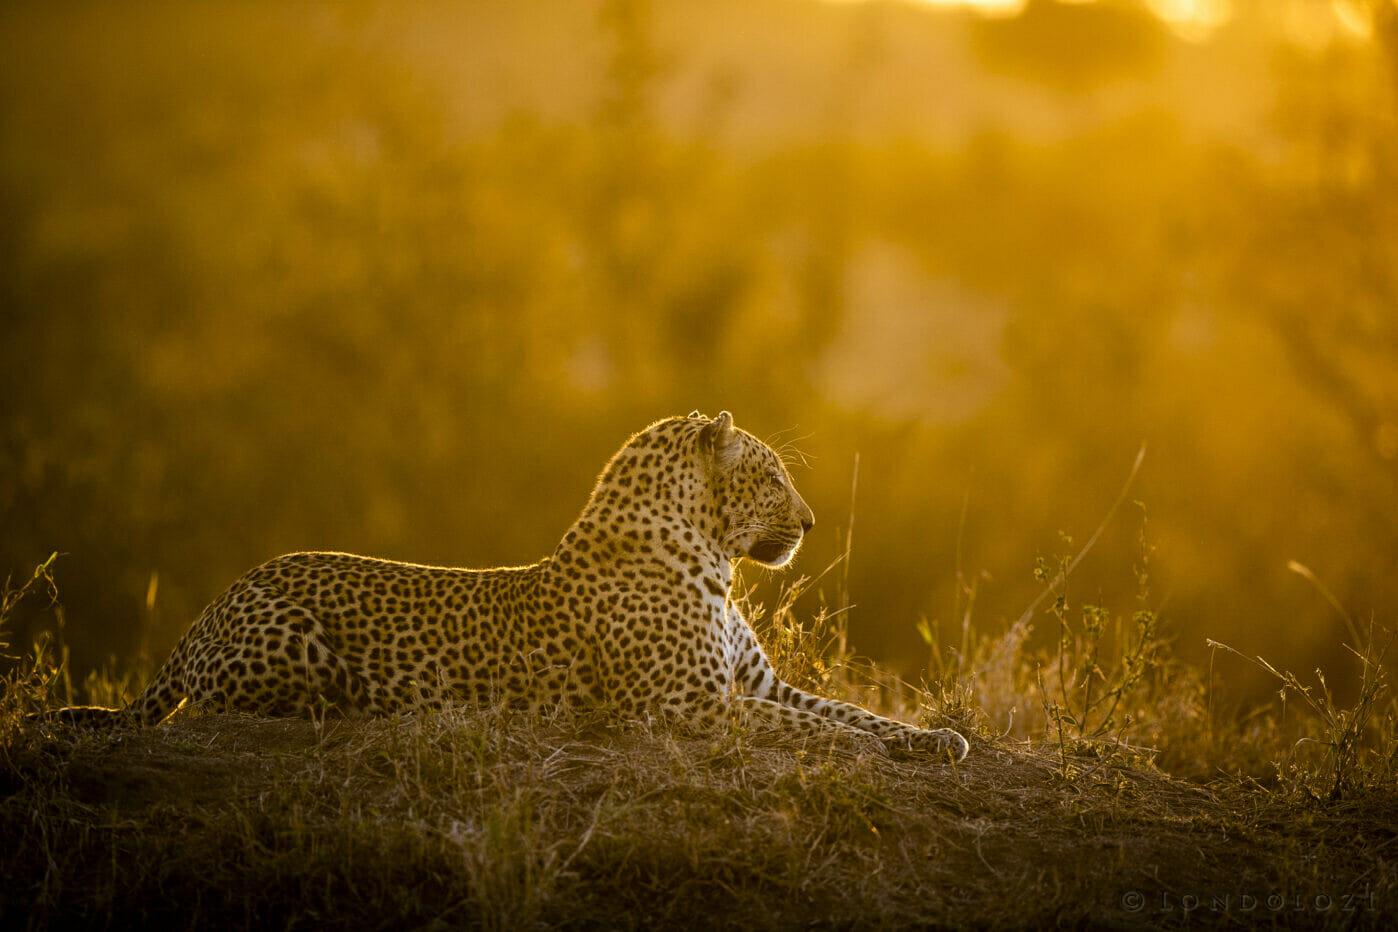 Sdz Senegal Bush Male Leopard Gold Light Termite Mound